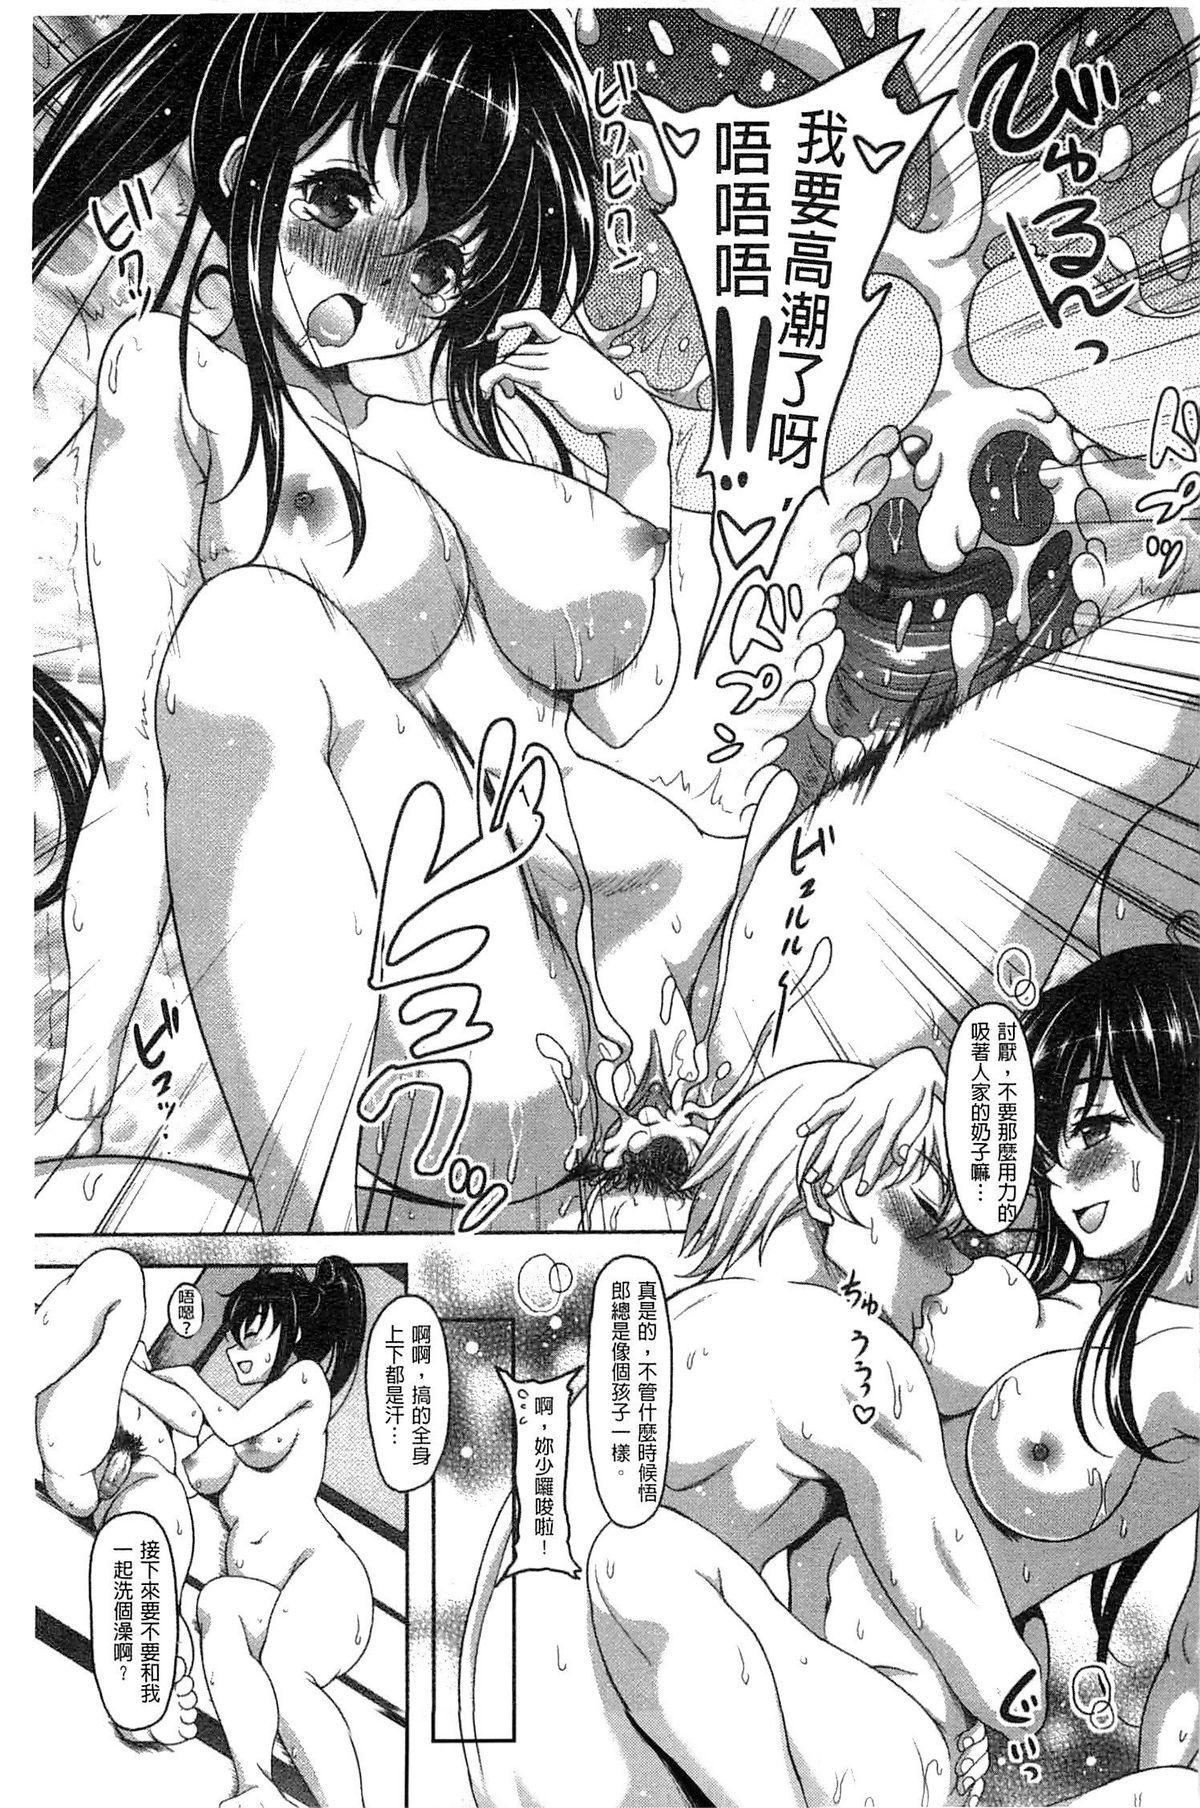 Hajimete nan dakara - First sexual experience 27